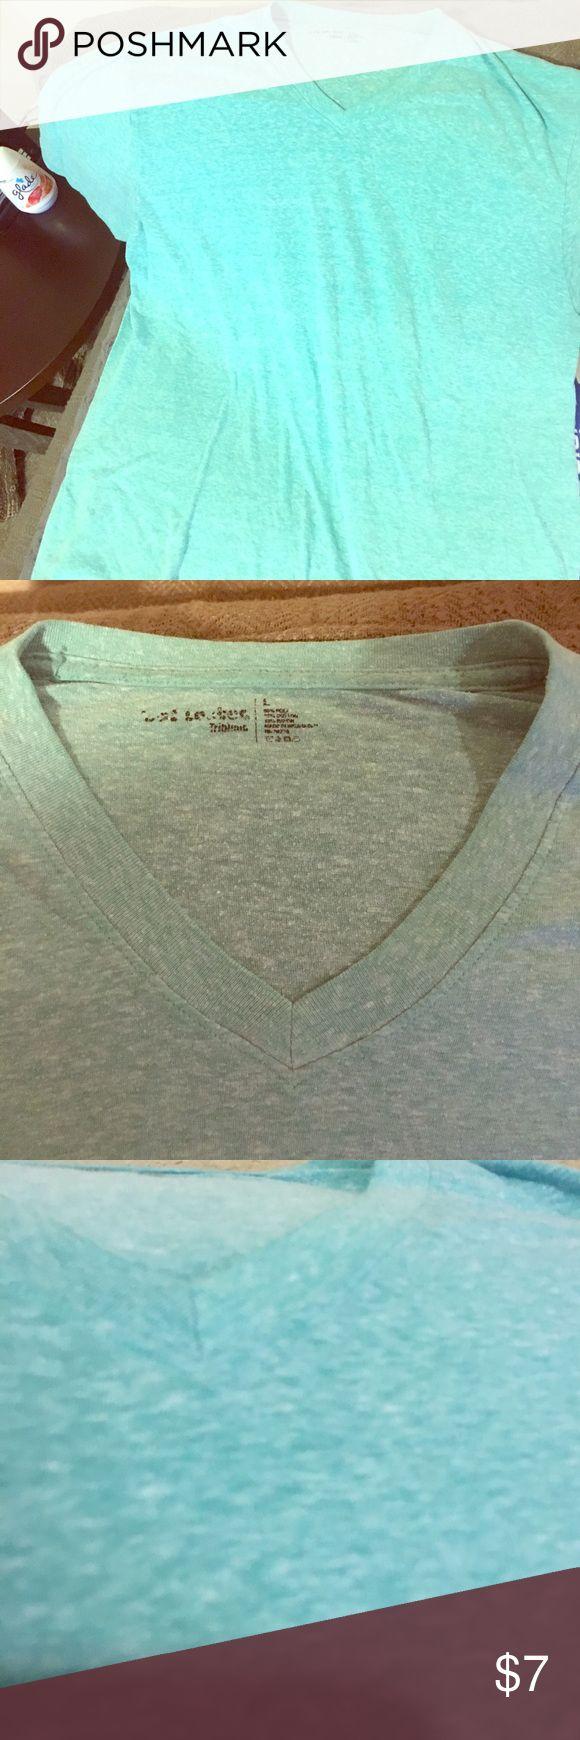 Men's L Teal V-neck T-shirt Men's Large, Heathered Teal V-neck T-shirt, Footlocker brand, gently used, great shape, soft and comfy! Footlocker Shirts Tees - Short Sleeve